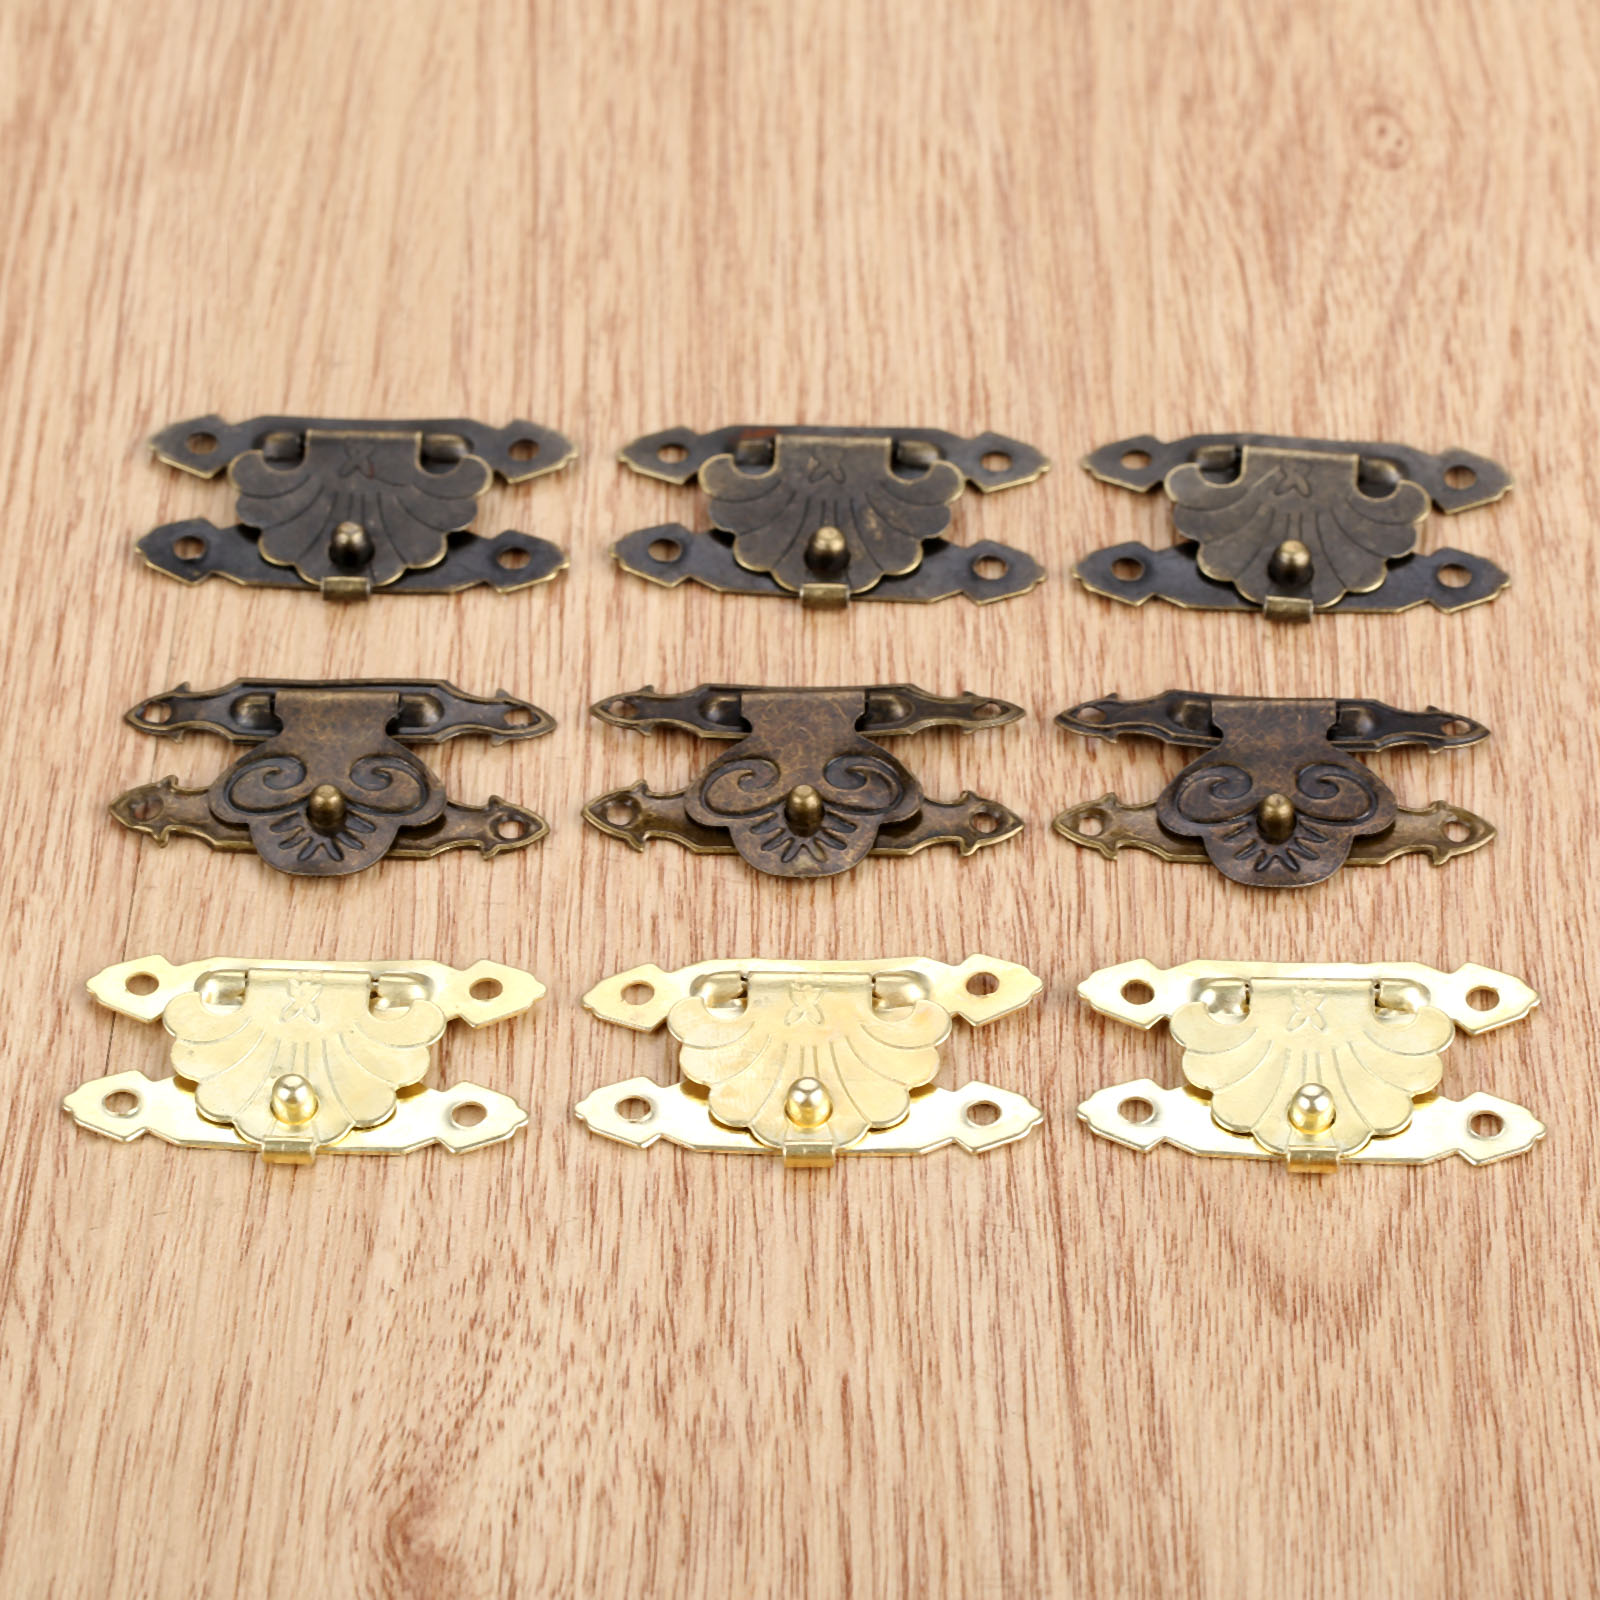 10Pcs Mini Antique Brass Hasps Wooden Case Jewelry Gift Box Decorative Hasp Latch Wood Finuture Hook Lock With 40Pcs Screw